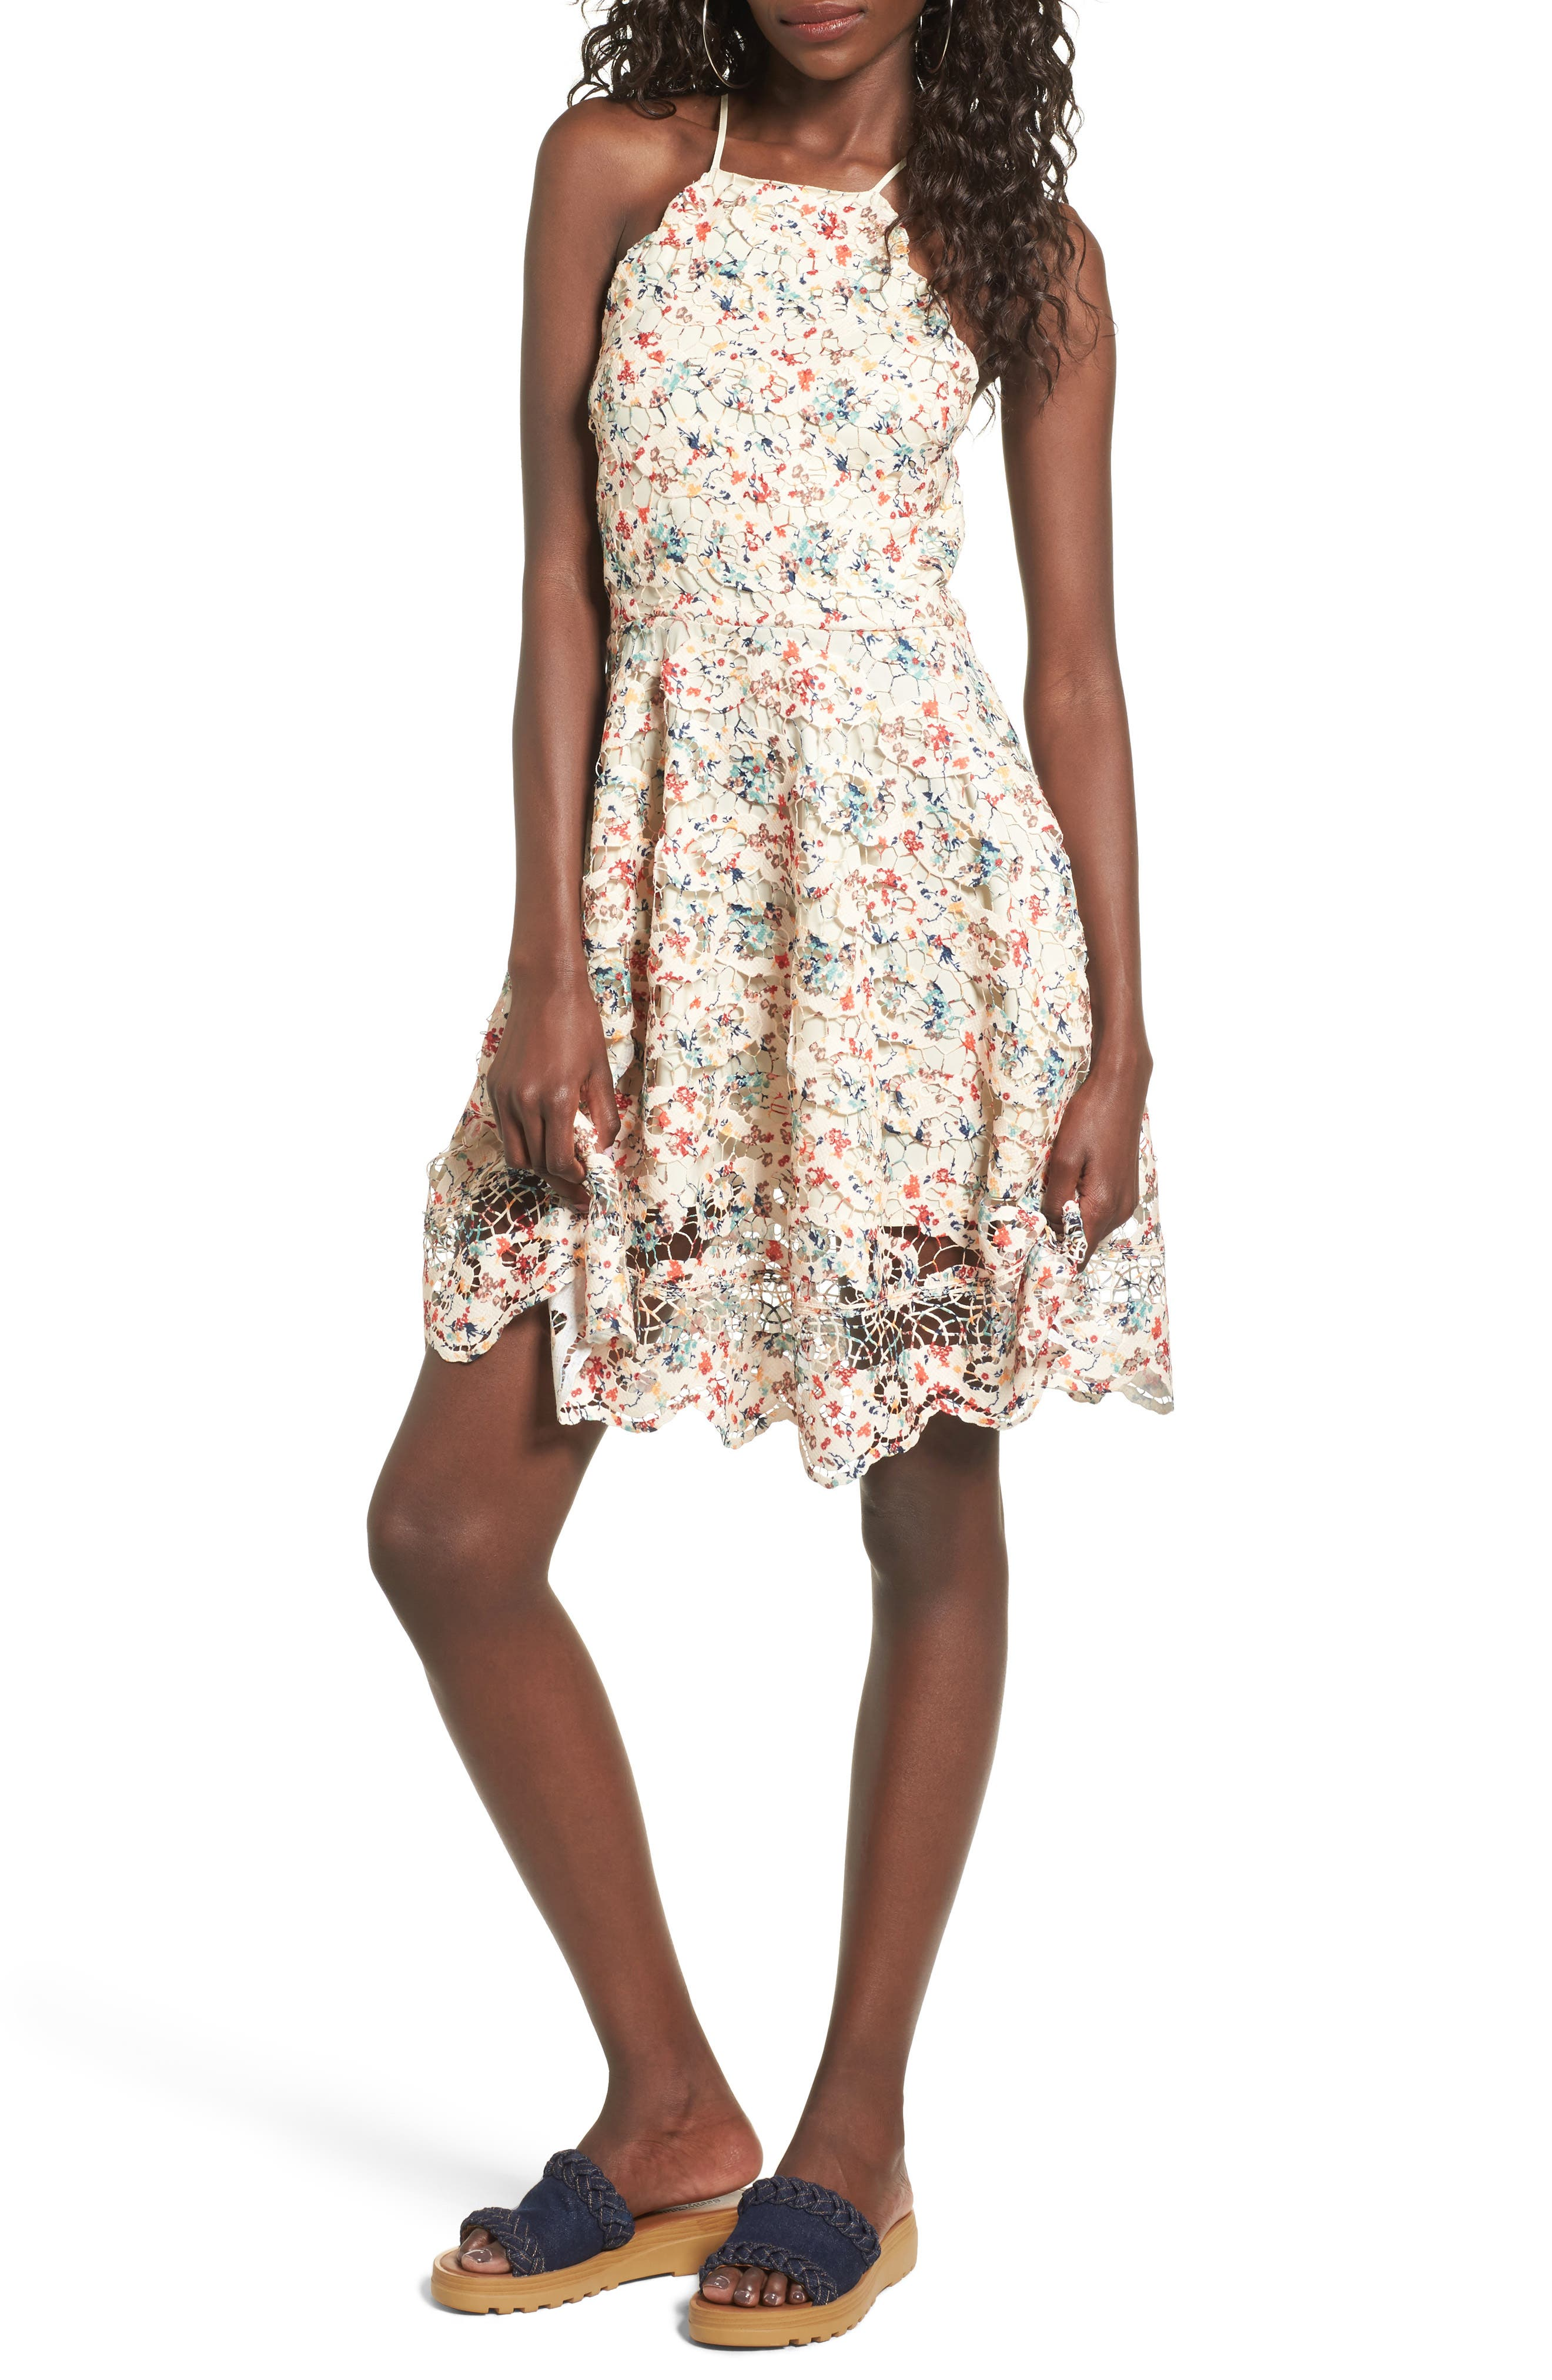 Alternate Image 1 Selected - Tularosa Cyrus Lace Skater Dress